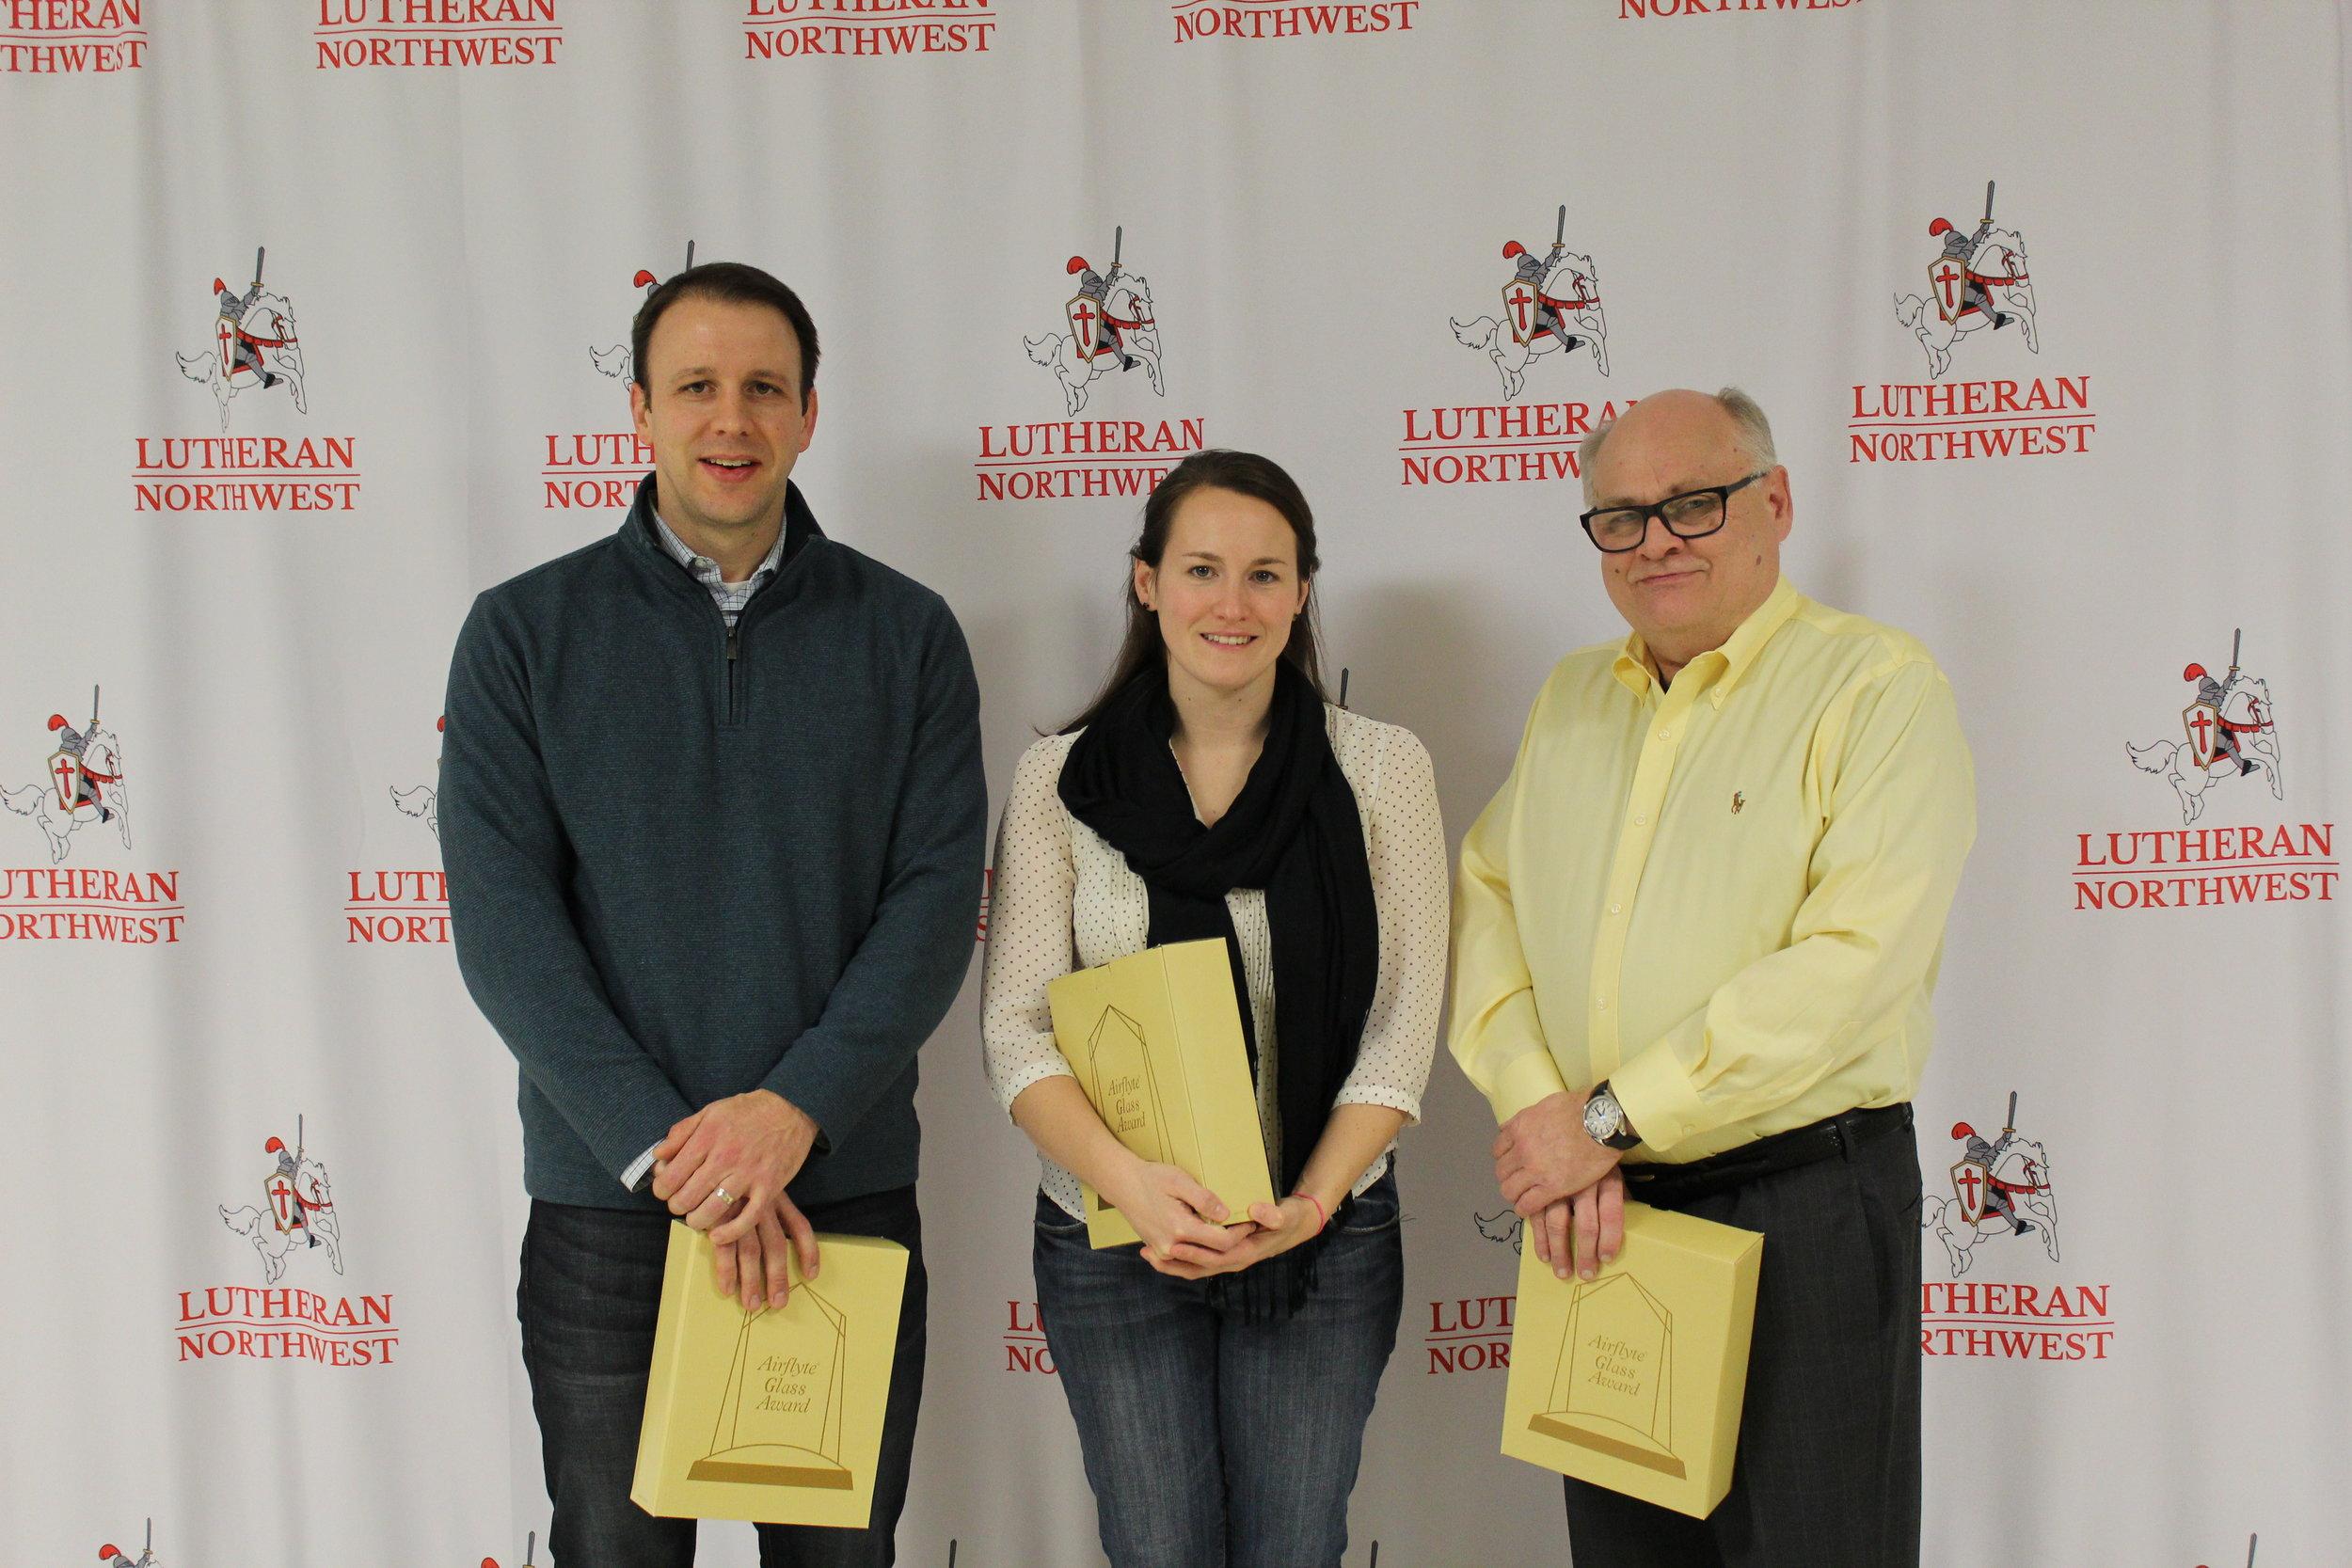 L to R: Dan Chewning, Meghan Katner Sternemann, Bob Katner